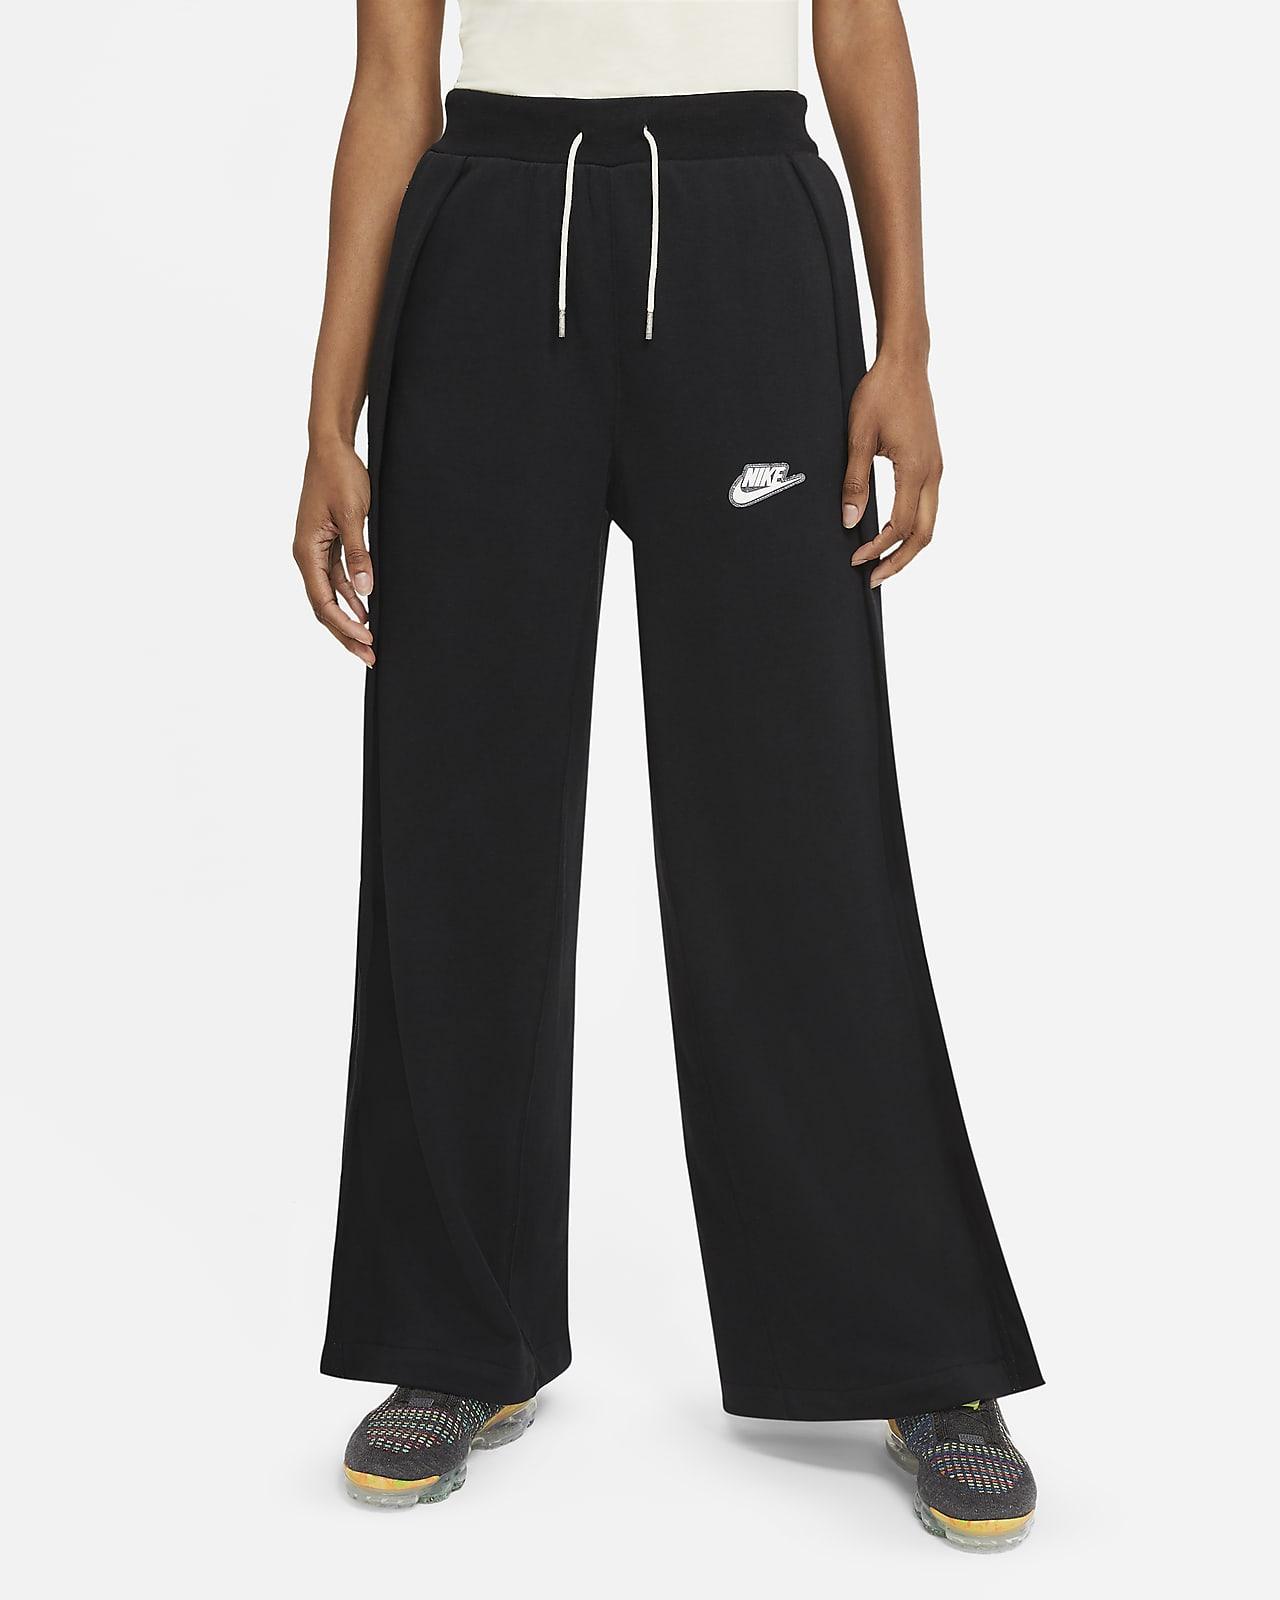 Nike Sportswear női franciafrottír-nadrág